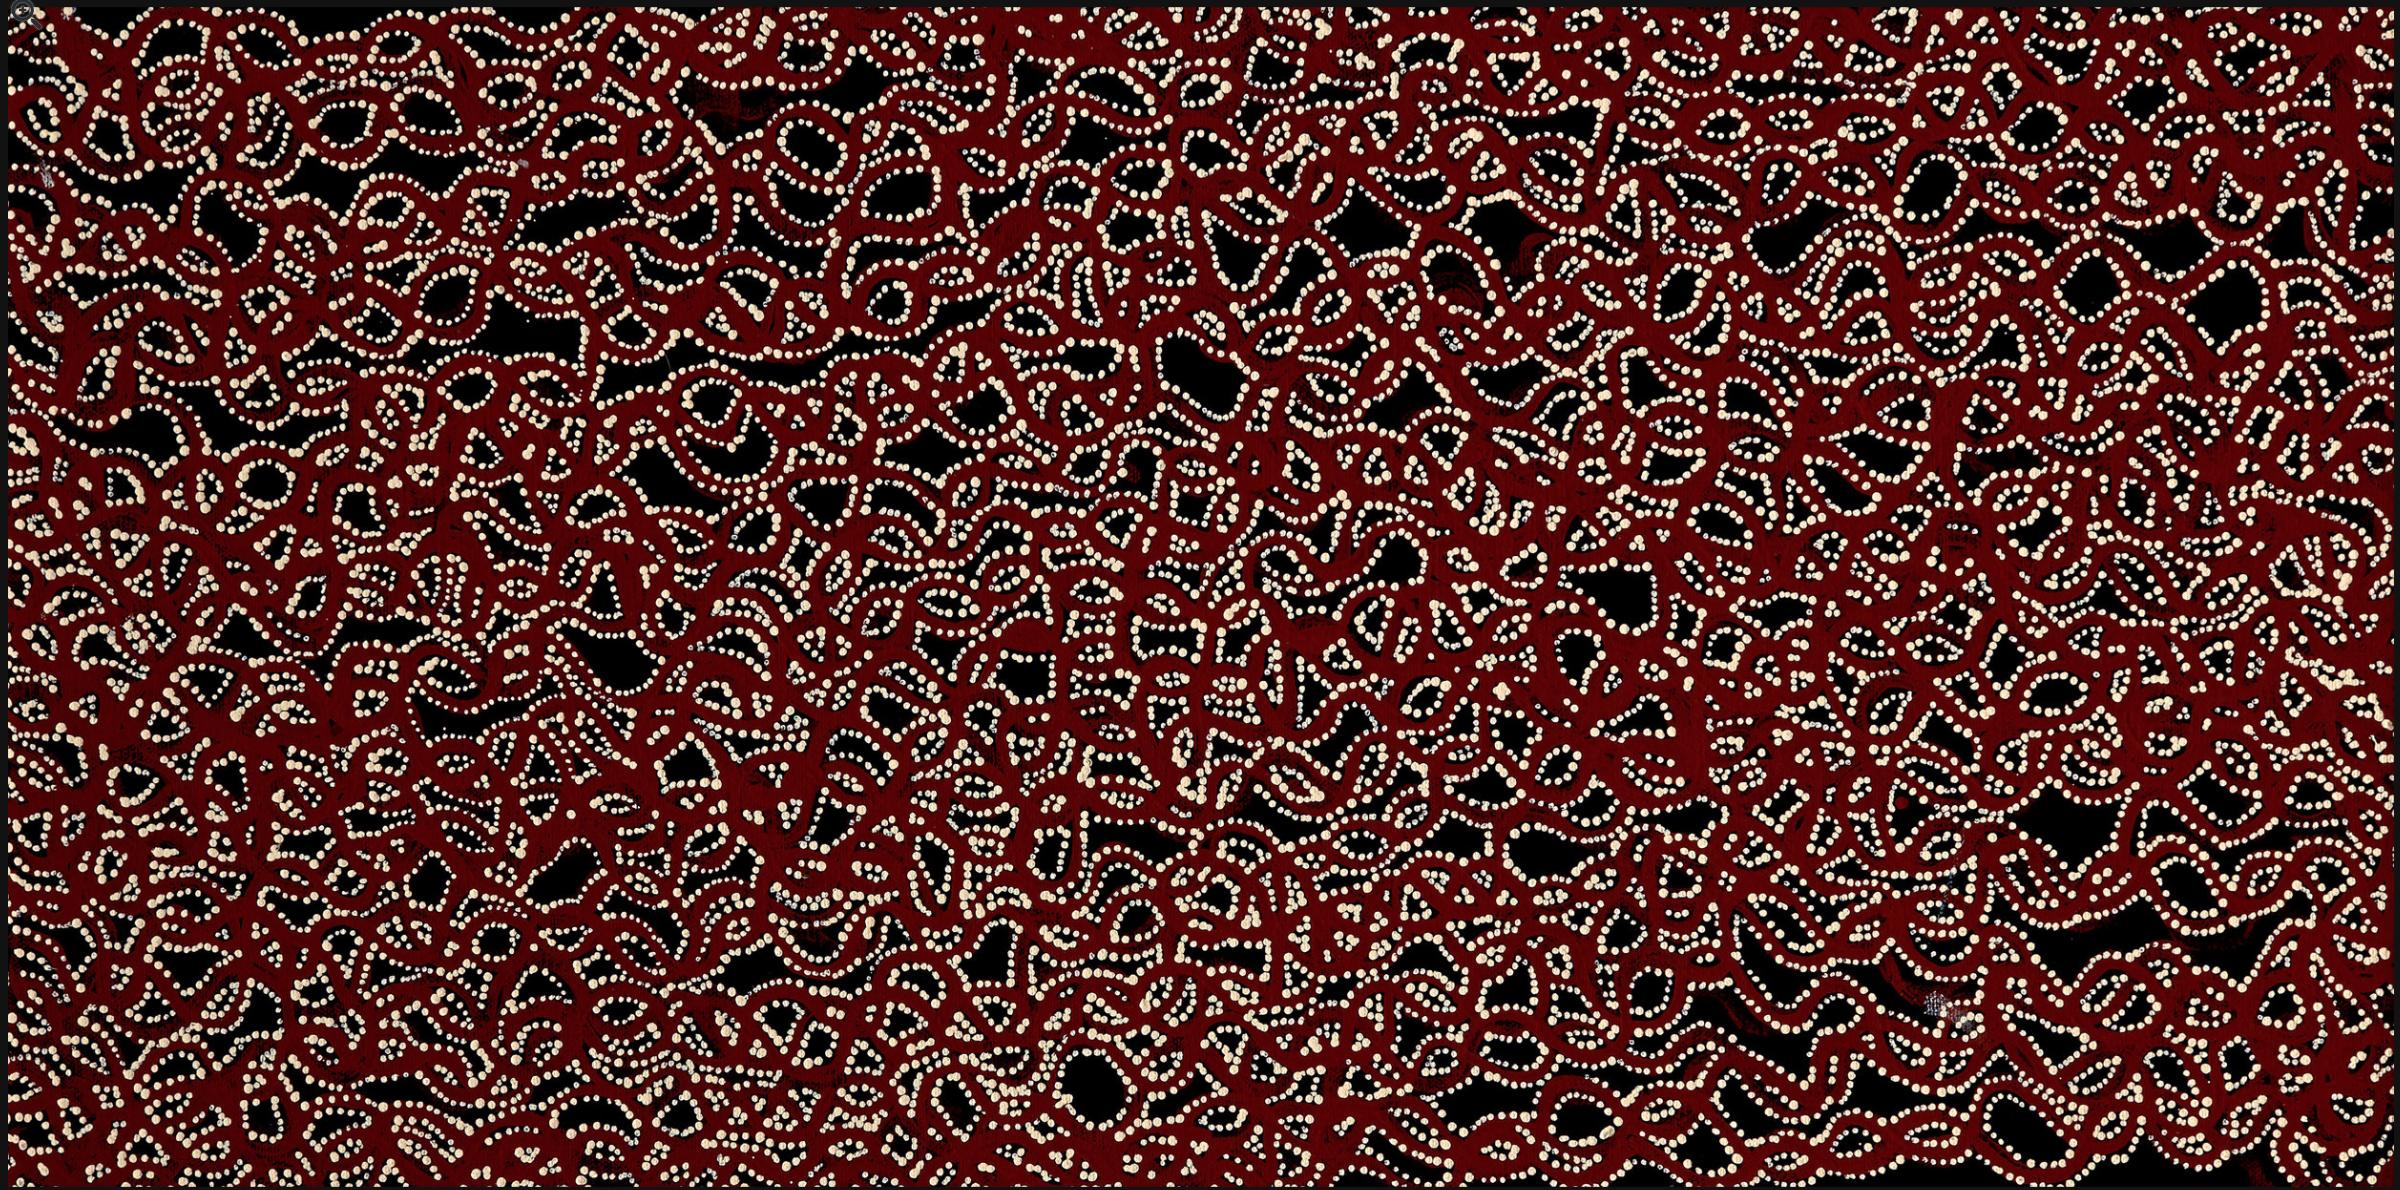 Ngalypi Jukurrpa Yanjirlpiri,Snake Vine Dreaming, by Geraldine Napangardi Granites